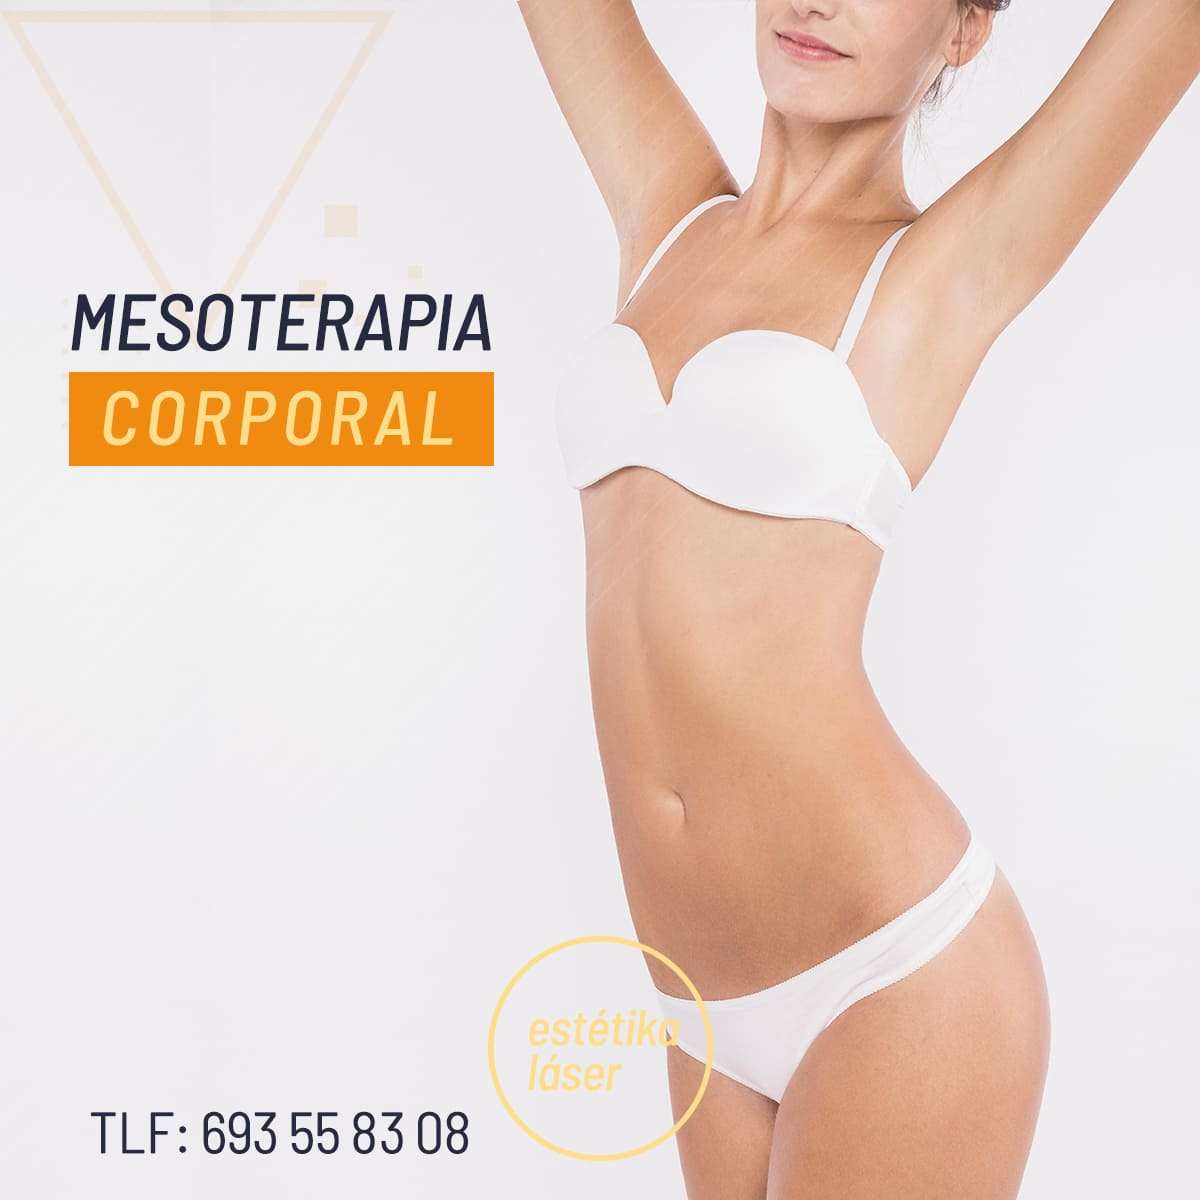 estetica avanzada murcia mesoterapia corporal 1